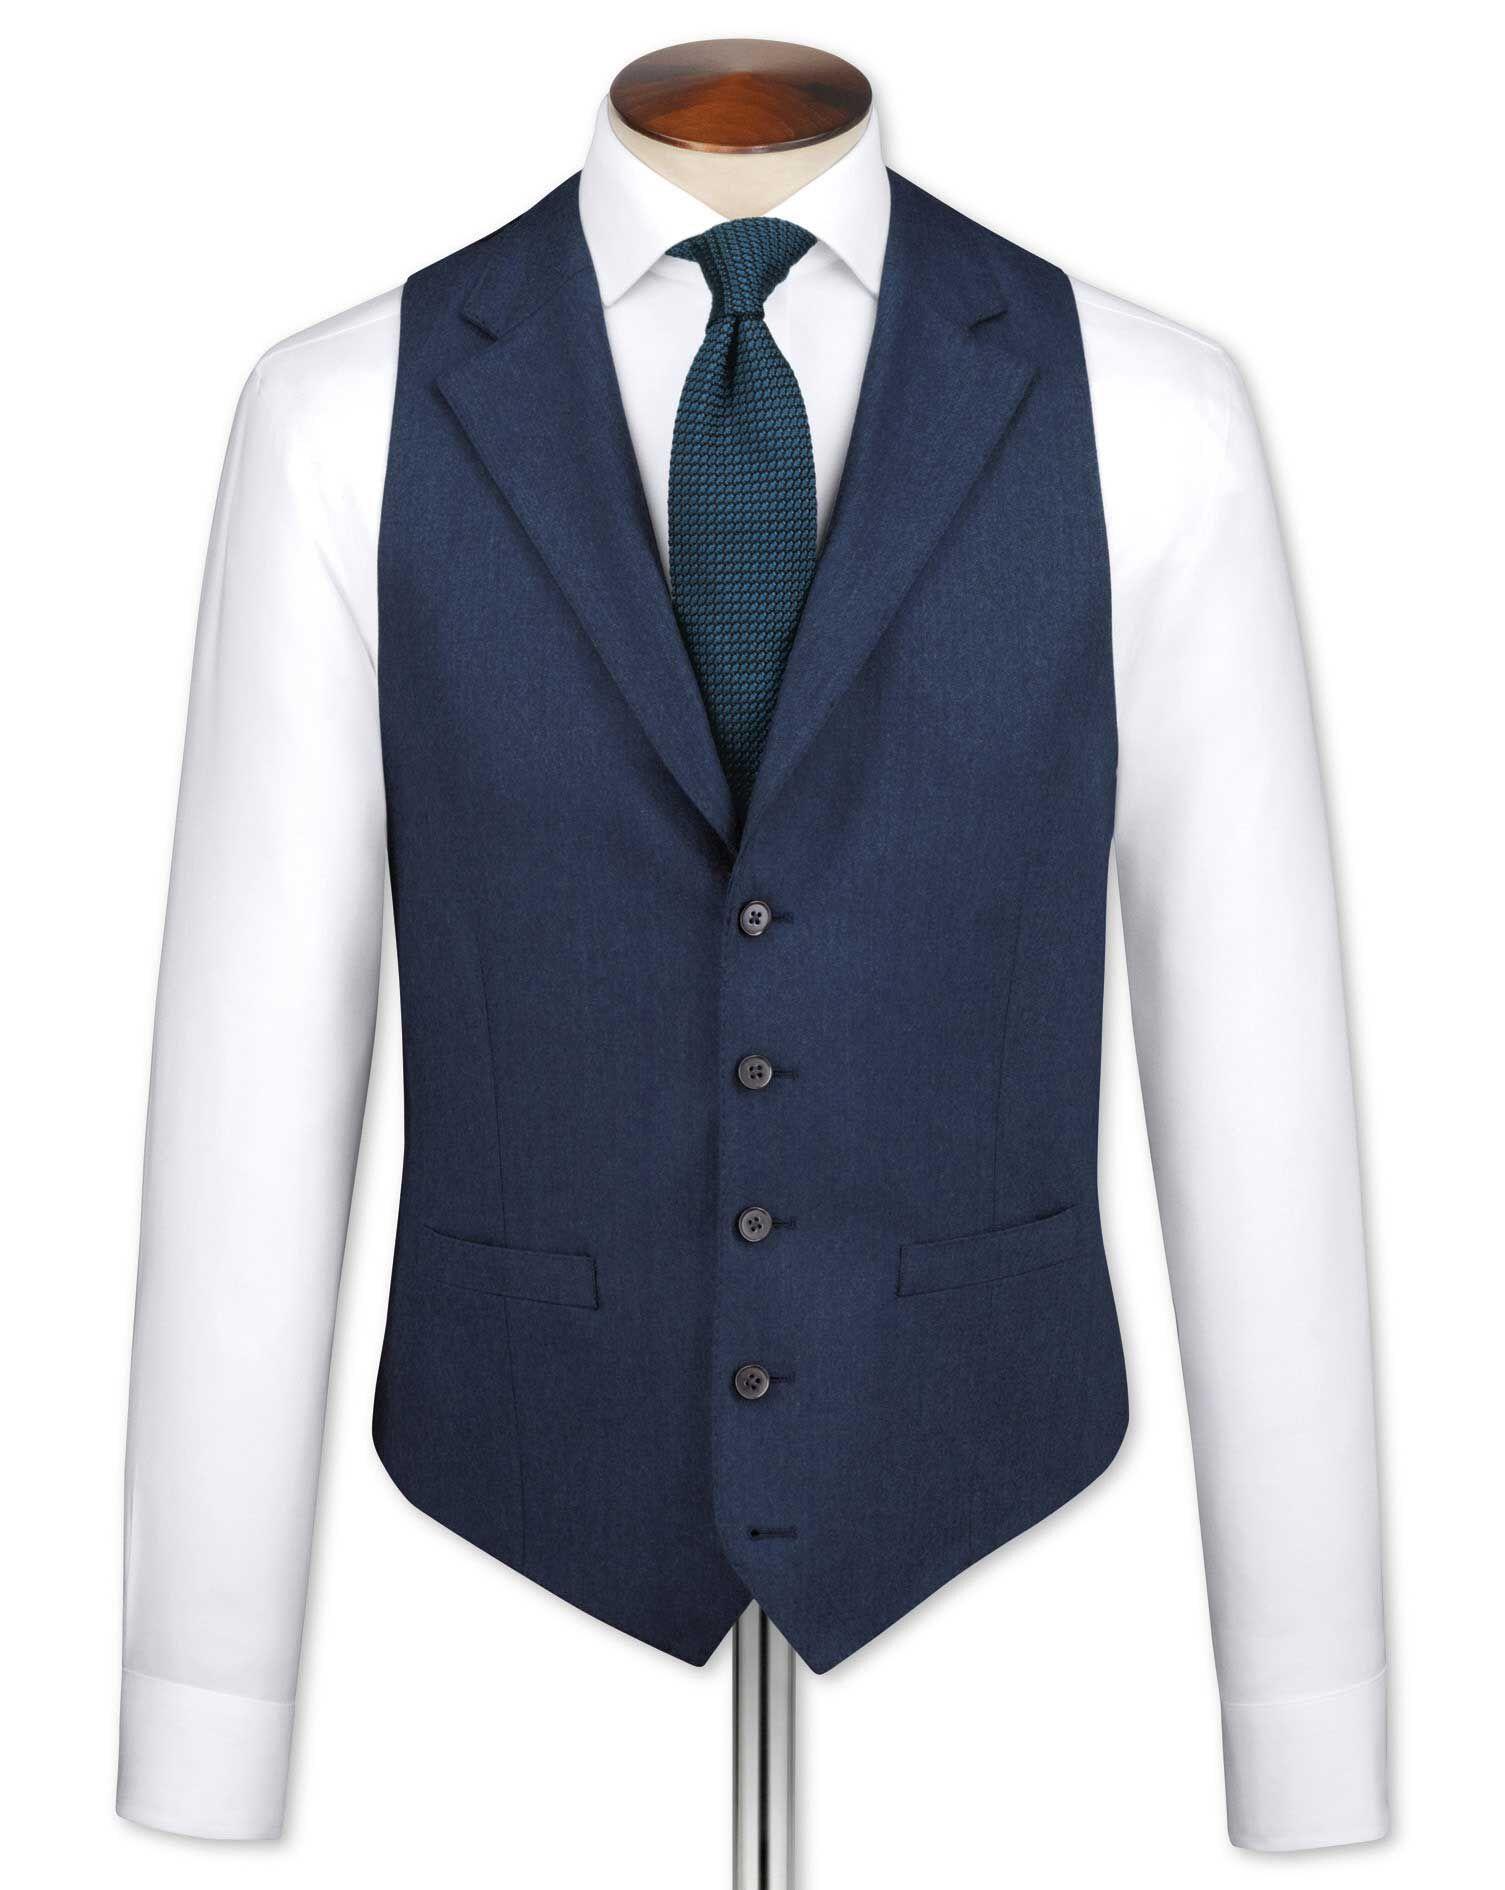 Blue Saxony Business Suit Wool Waistcoat Size w38 by Charles Tyrwhitt